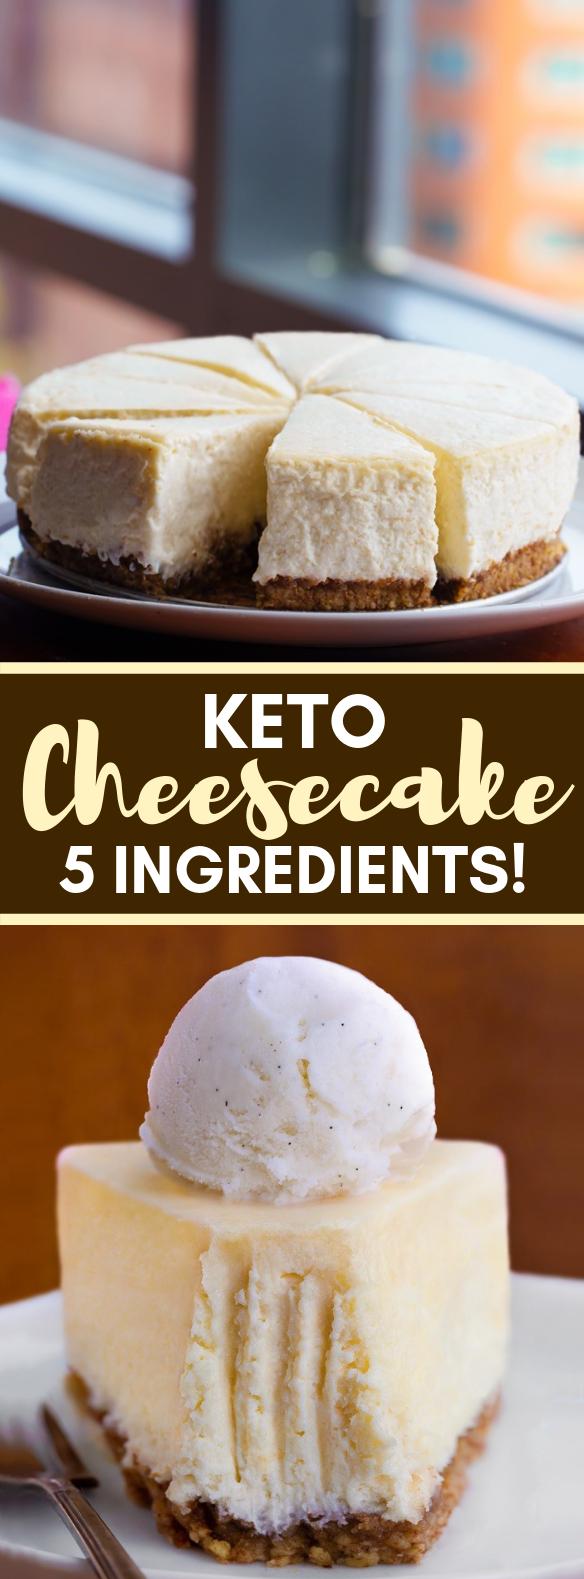 Keto Cheesecake – Just 5 Ingredients! #healthydiet #ketogenic